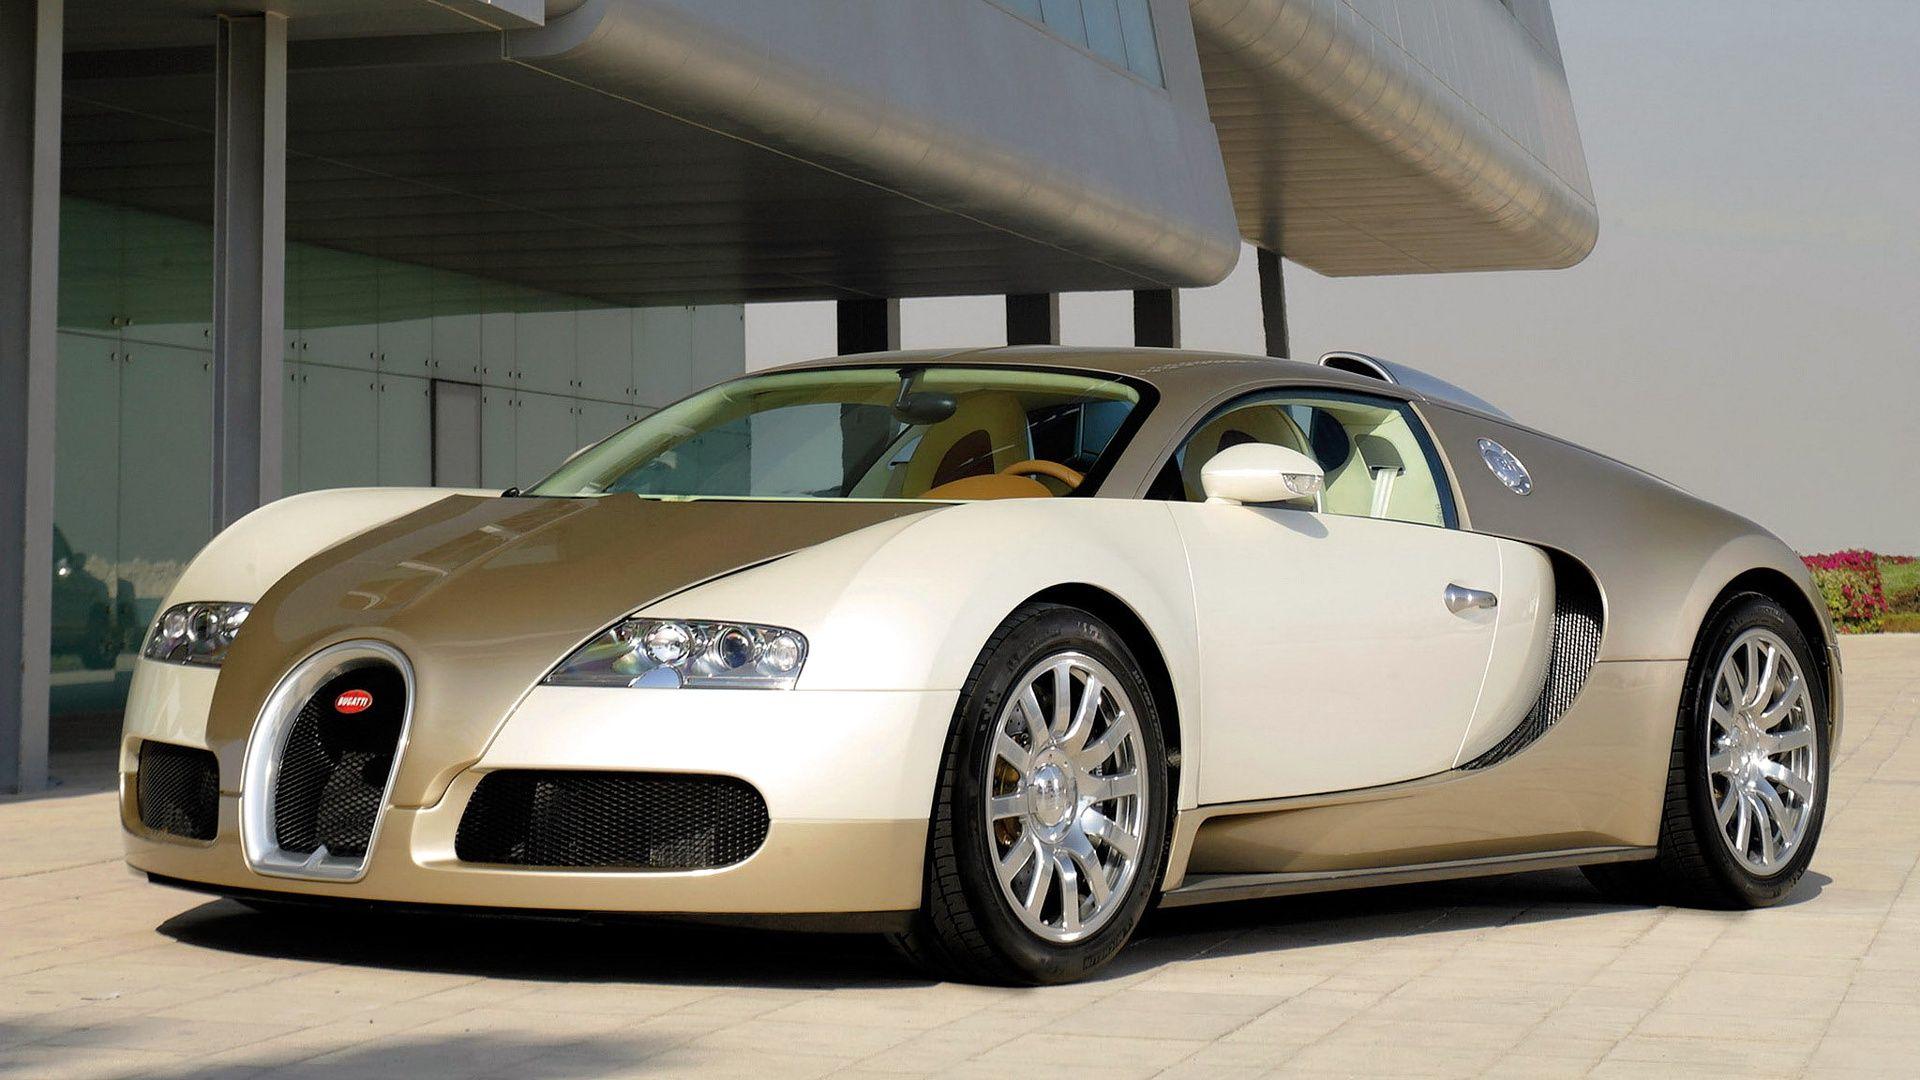 afcf33e86c202122b29e791953ad3618 Cozy Bugatti Veyron and Chiron Difference Cars Trend